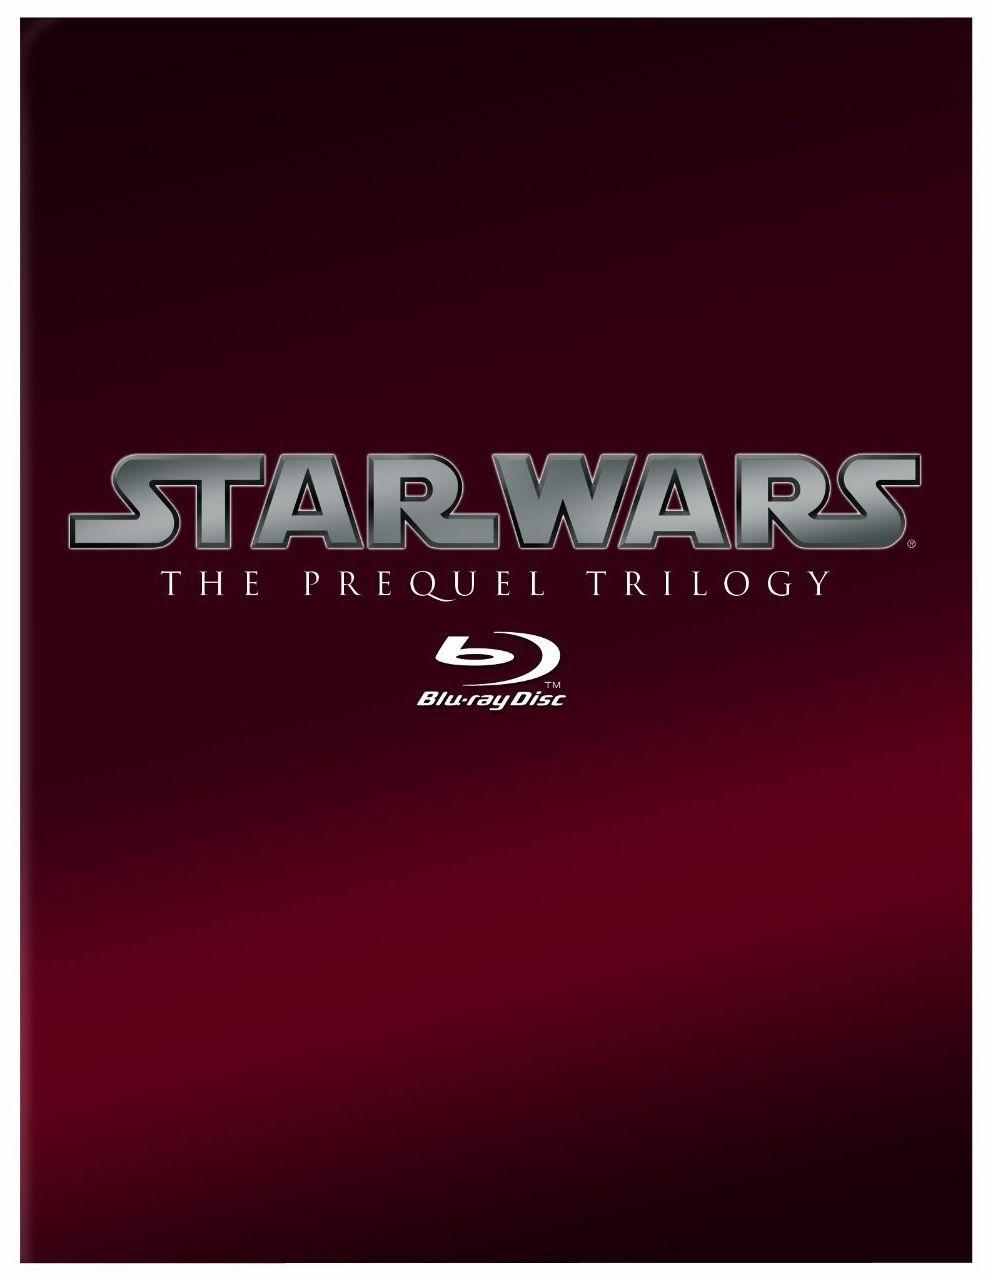 Blu Ray : Star Wars Saga - Ultime Box Set - Page 6 42869722